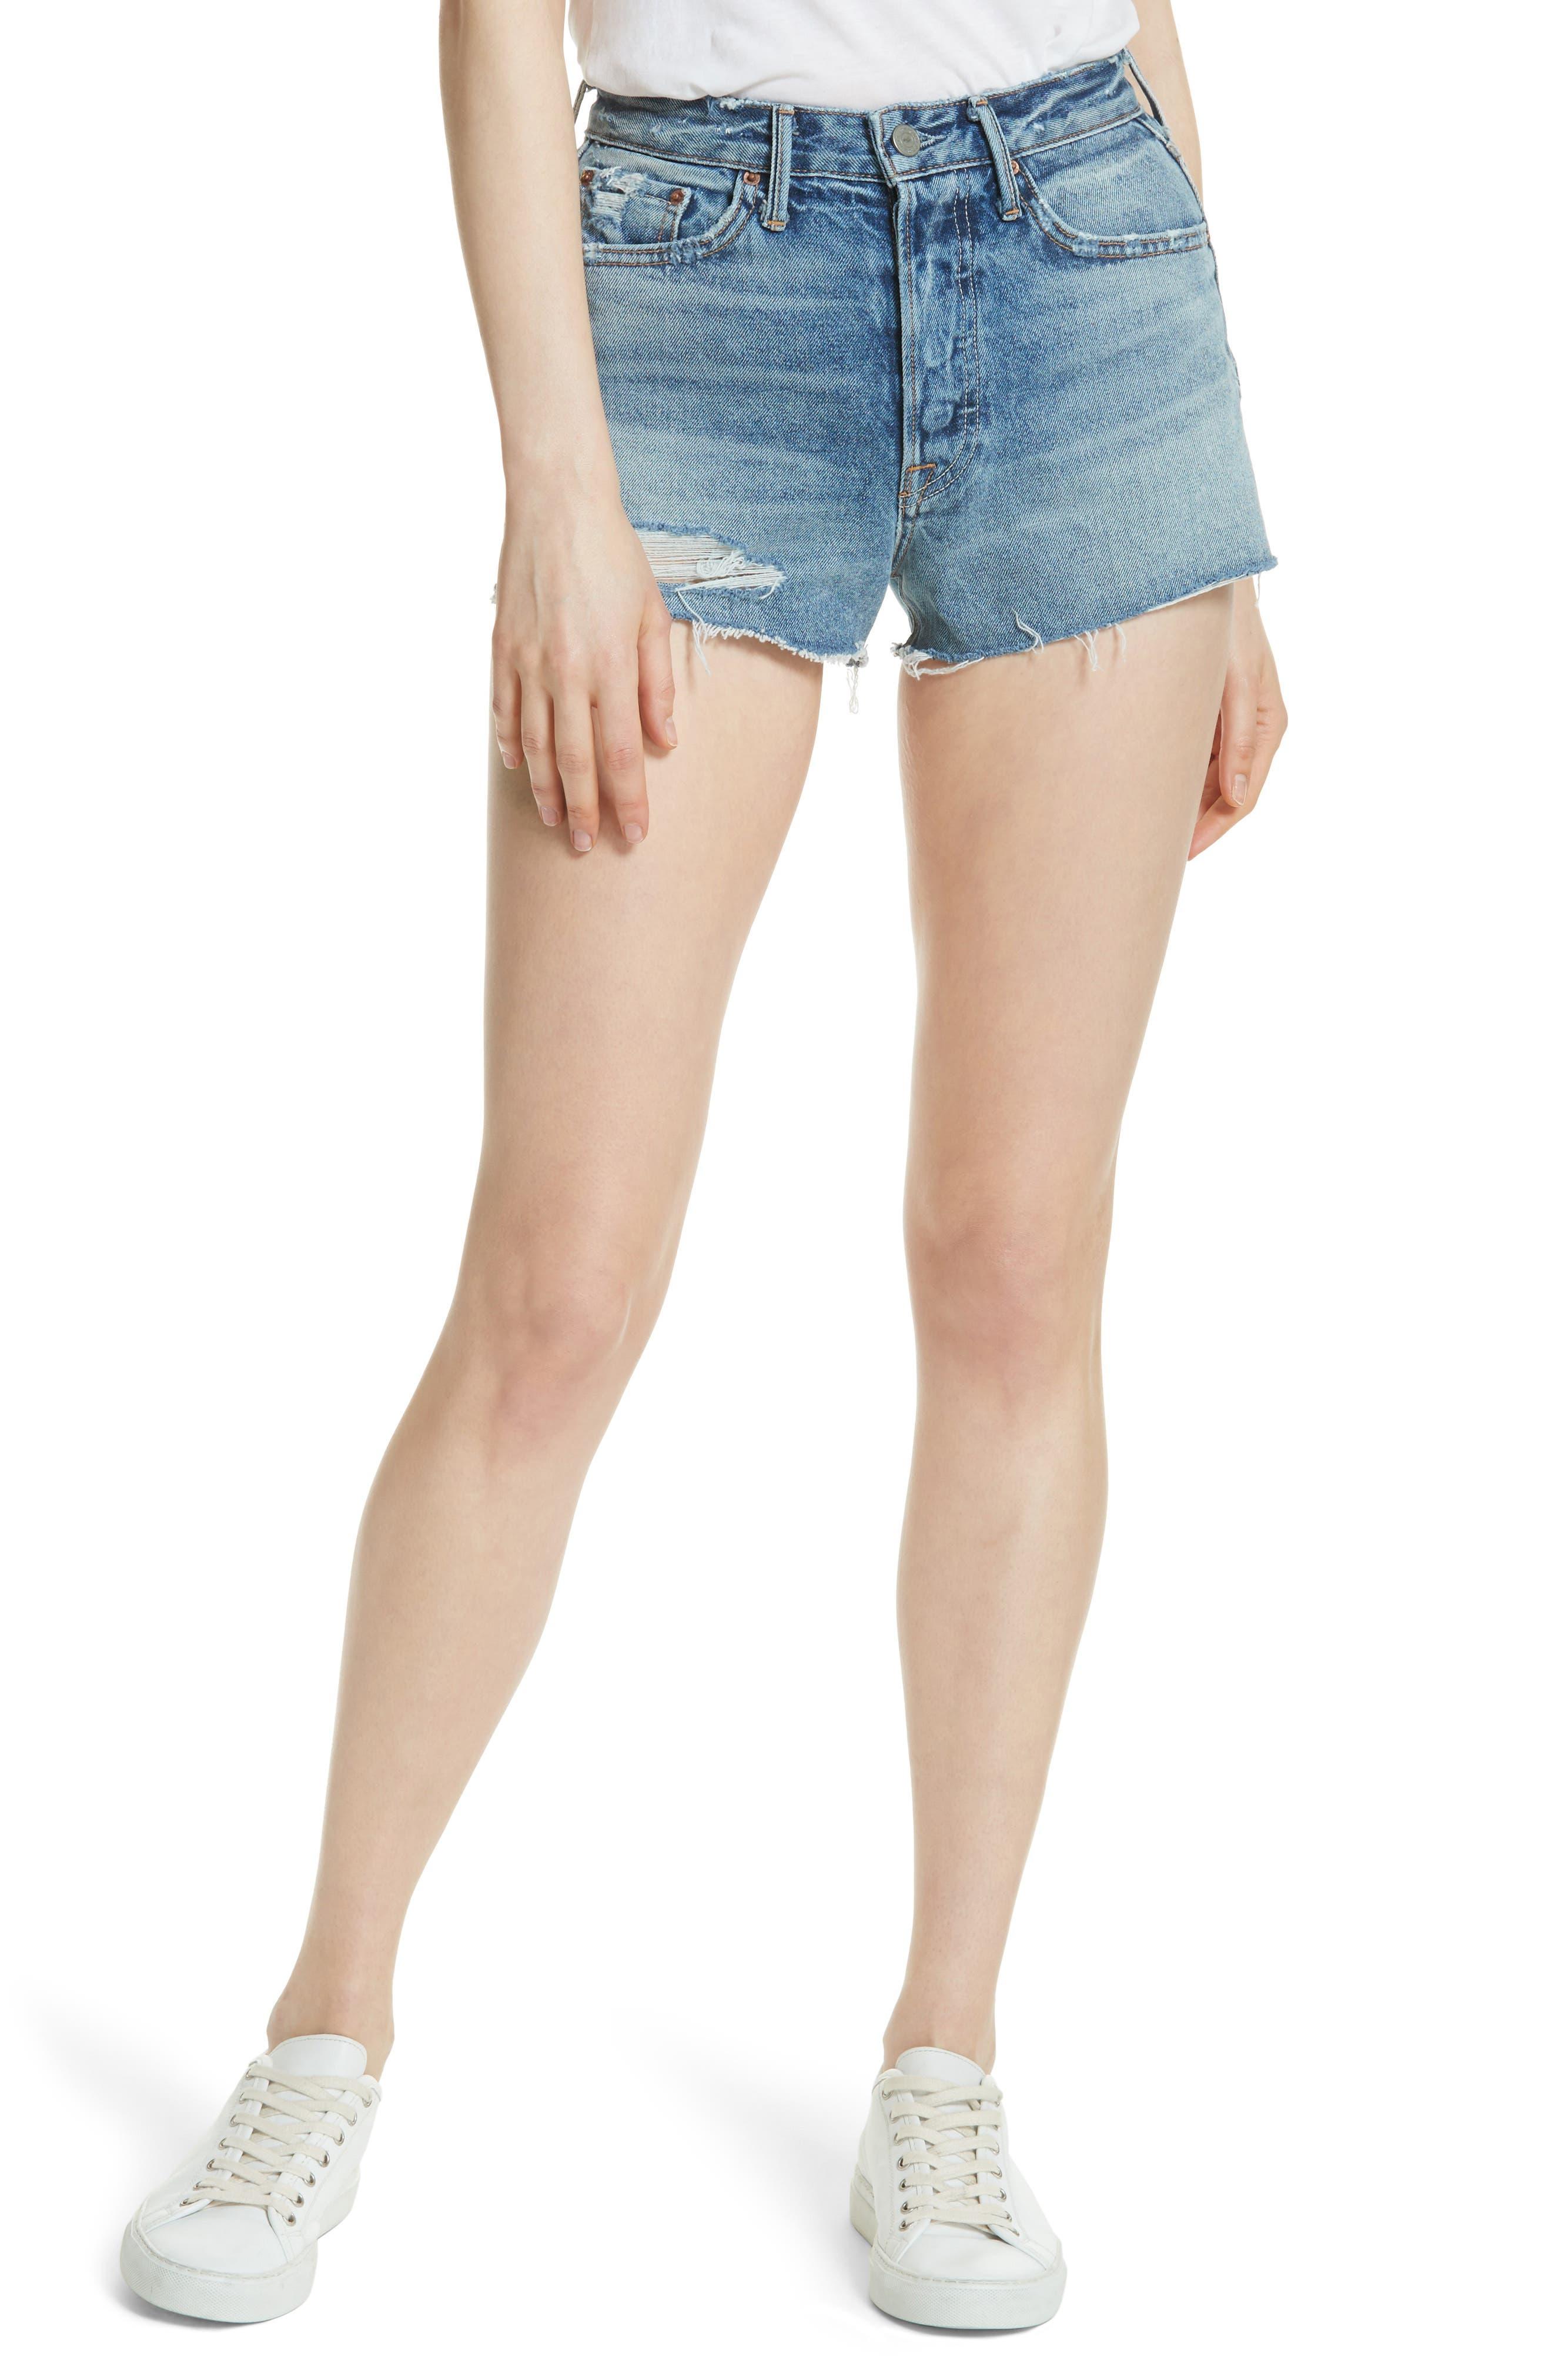 Cindy Rigid High Waist Denim Shorts,                             Main thumbnail 1, color,                             473